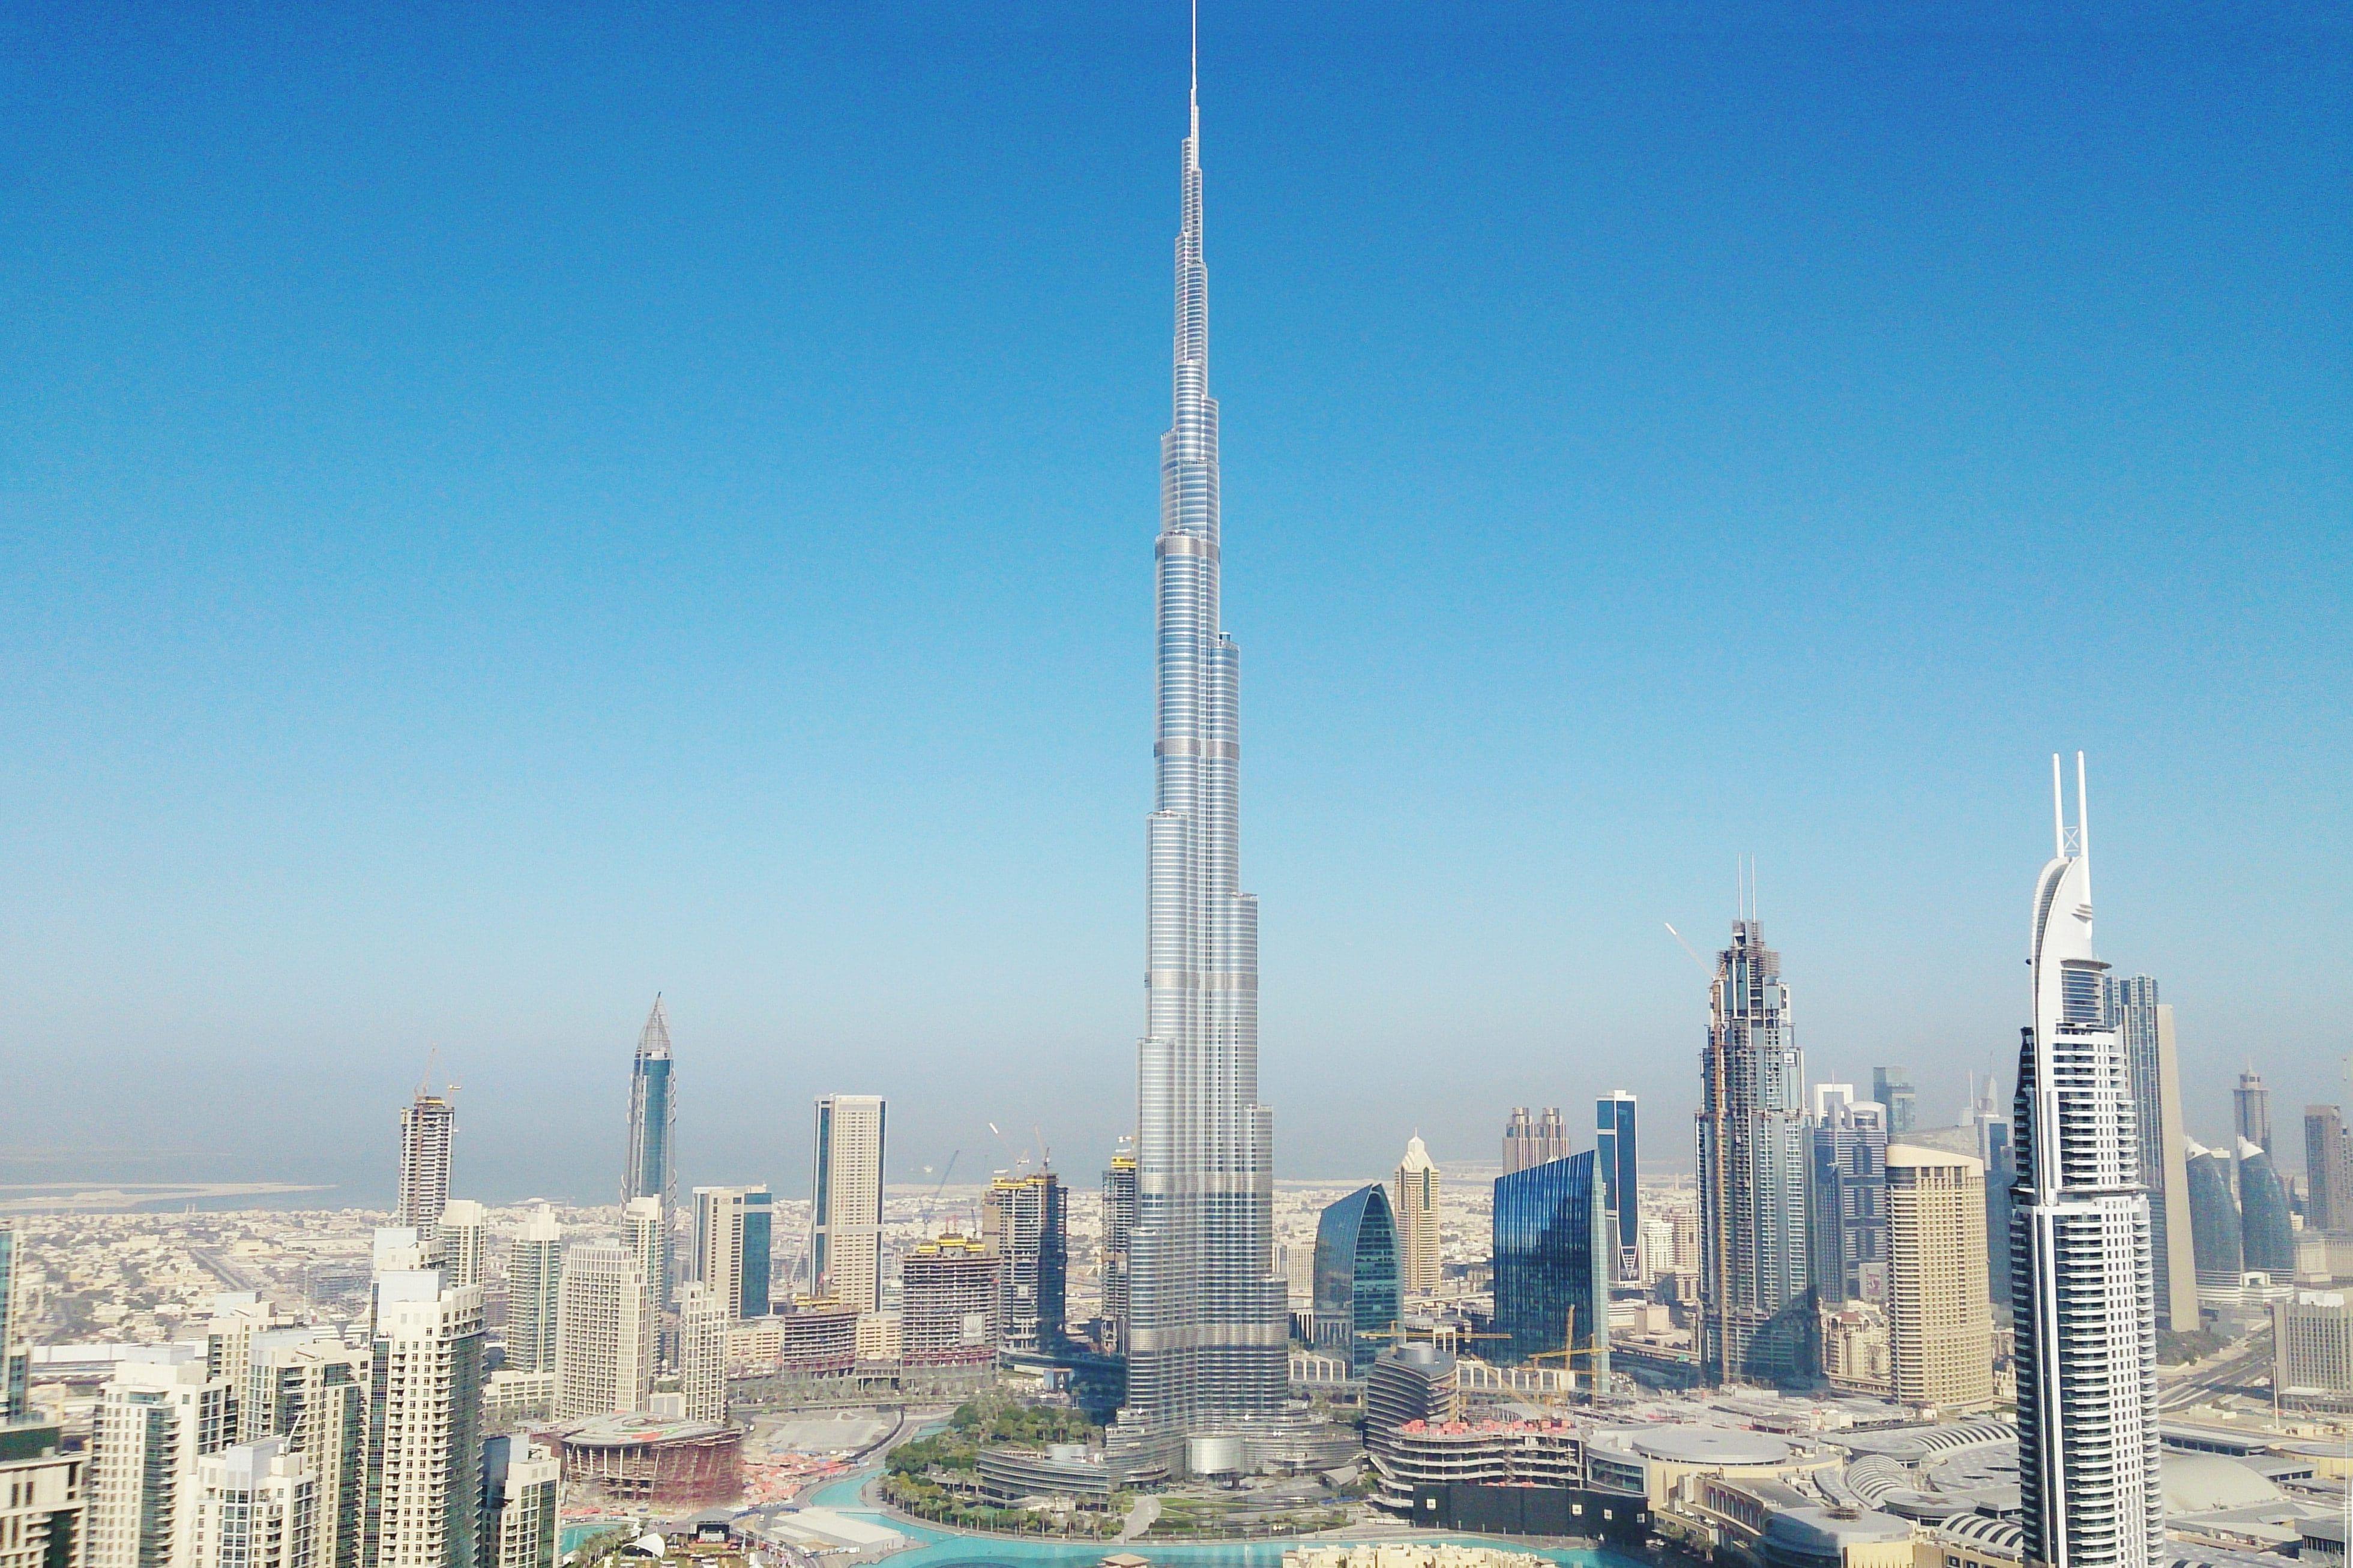 Burj Khalifa and the Dubai skyline